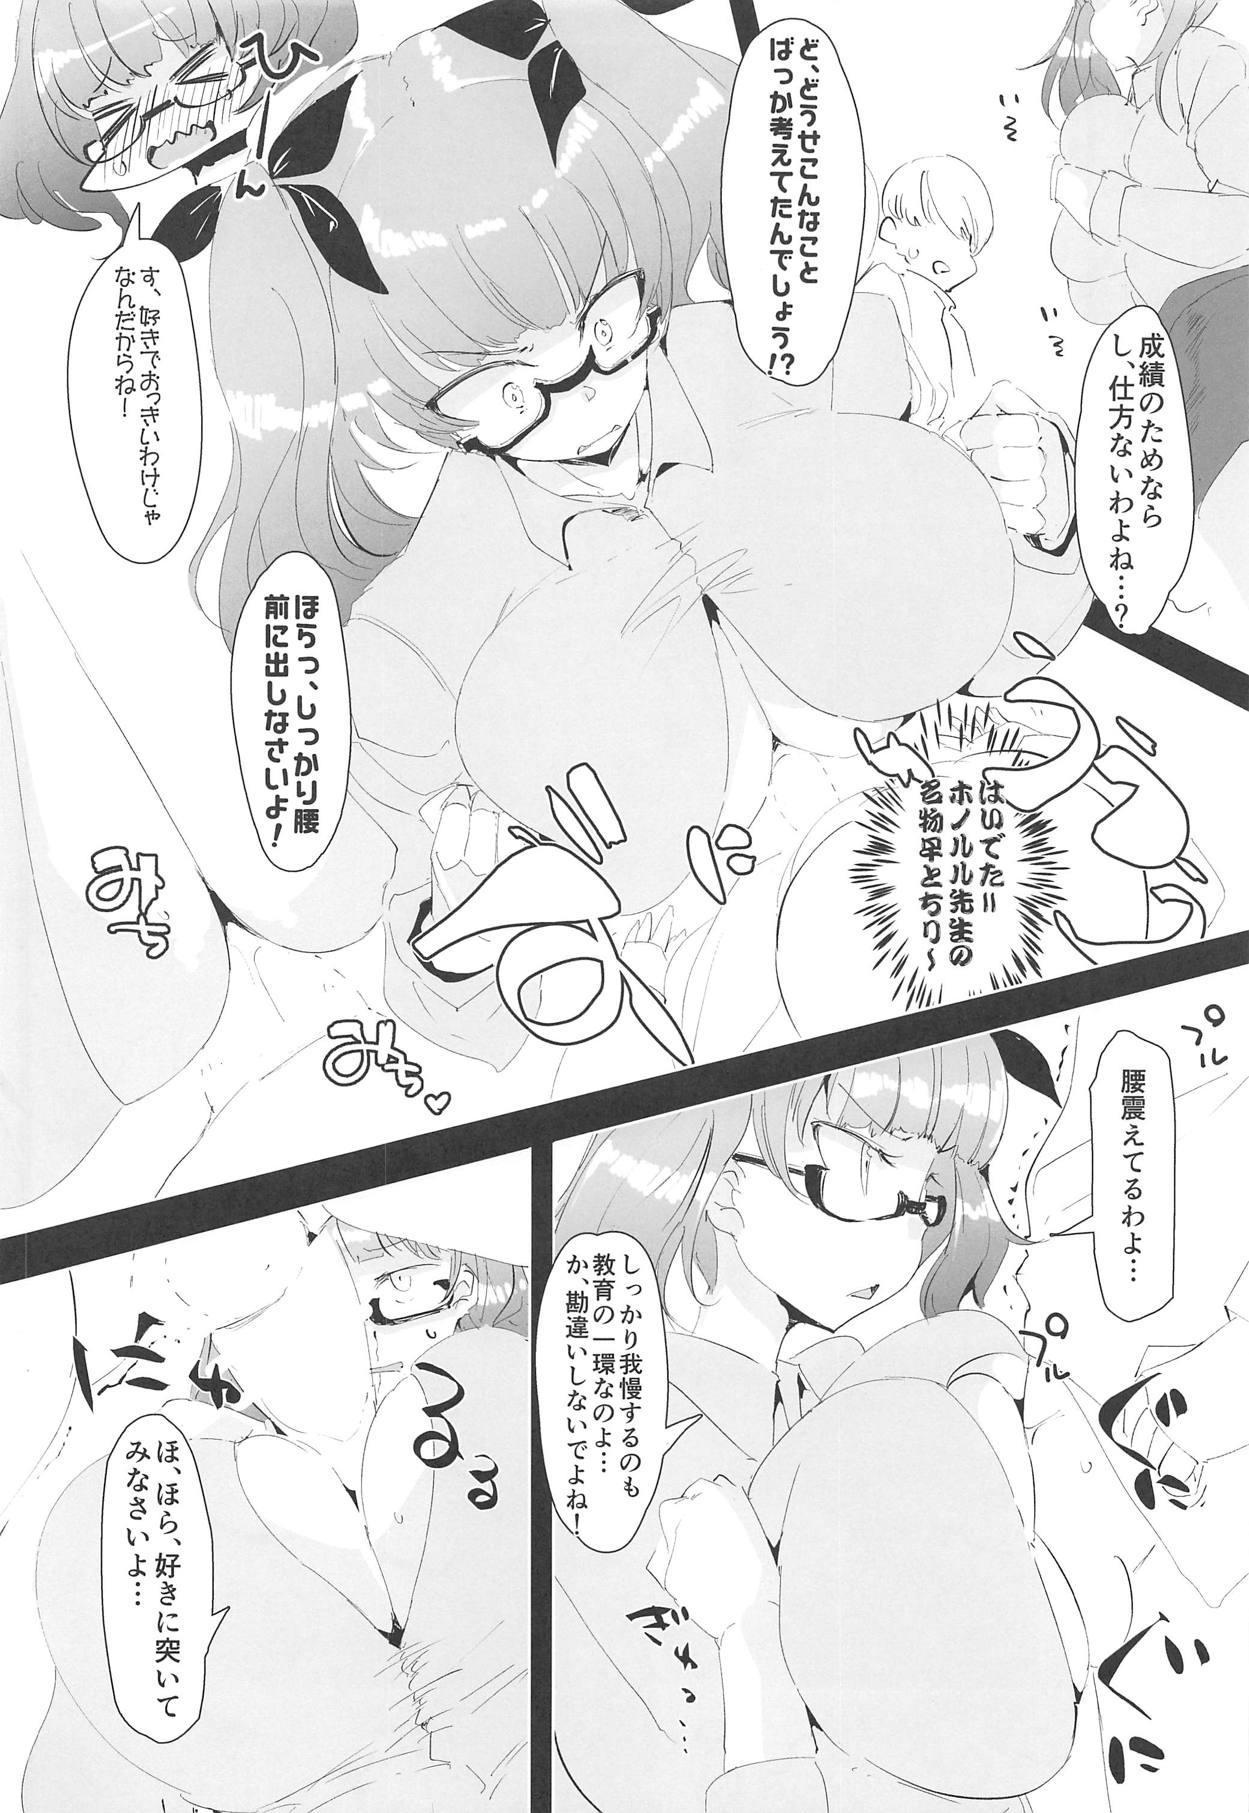 (C95) [Seigou (Seigo)] 3-nen β-gumi Honolulu Sensei (Azur Lane) 3